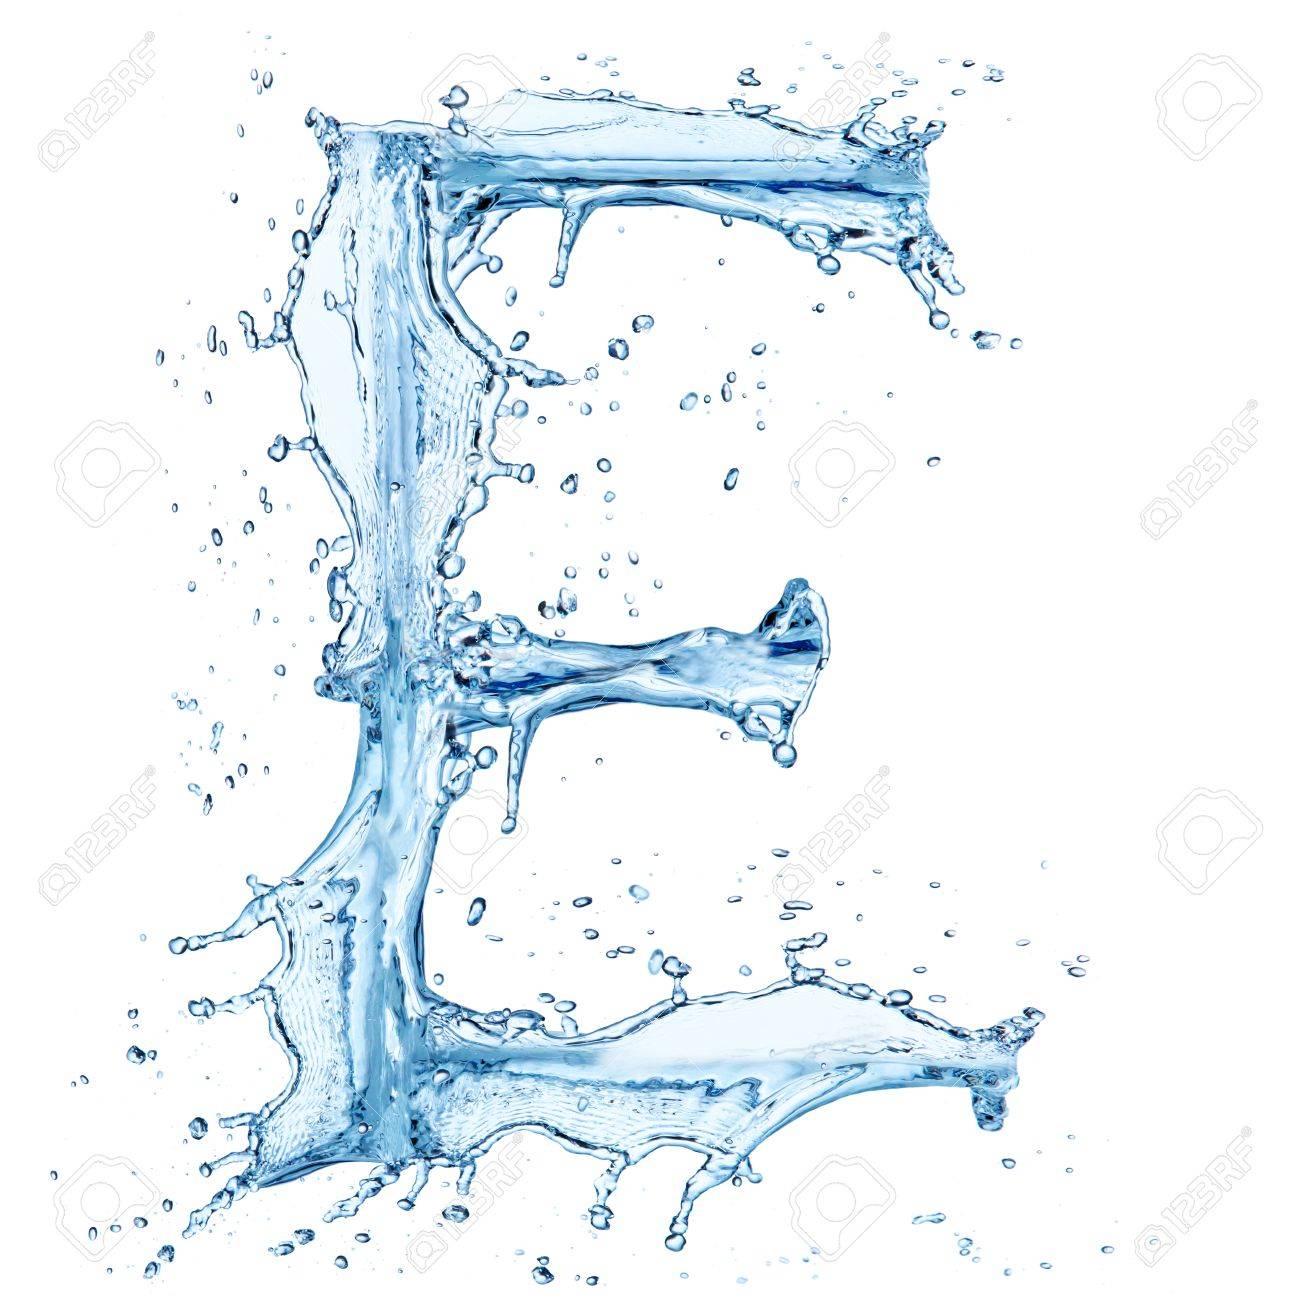 Water splashes letter Stock Photo - 14209316